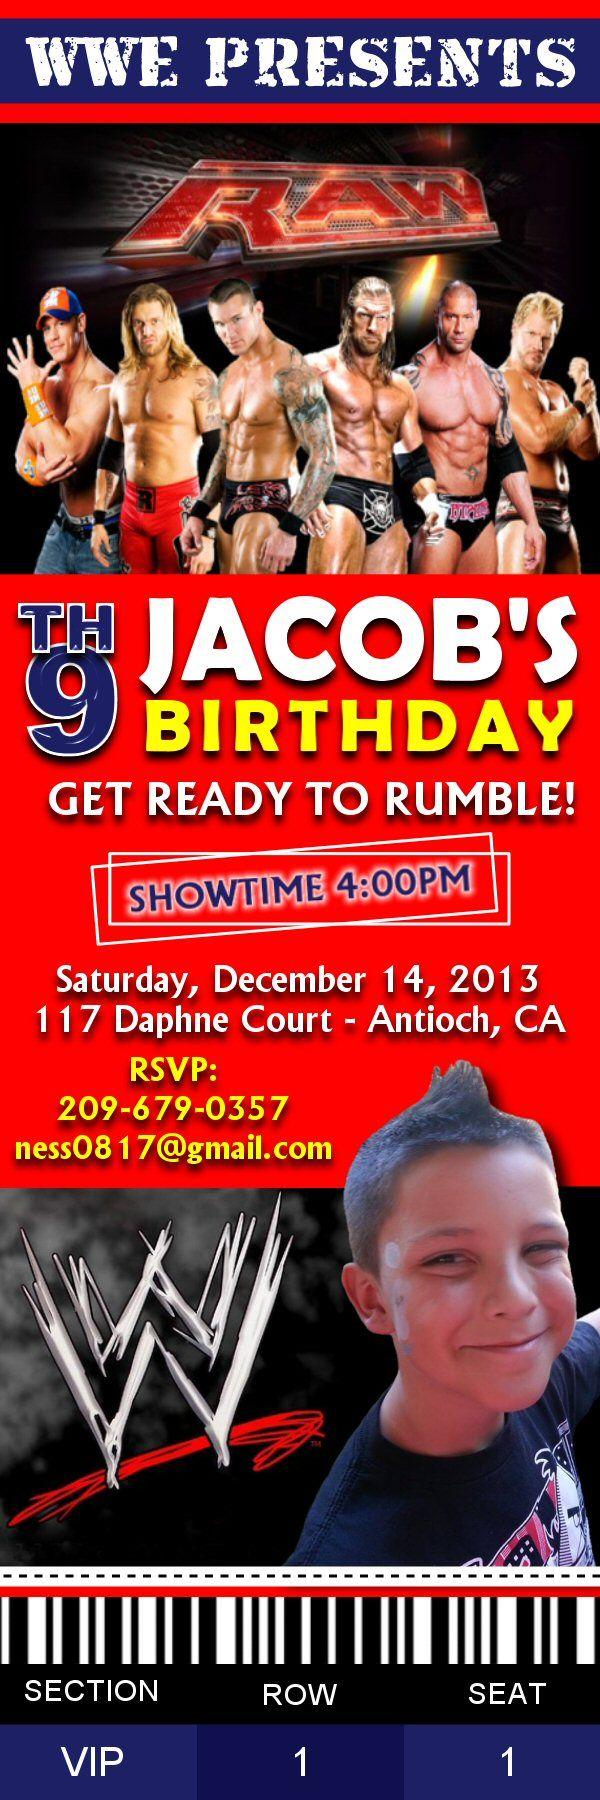 Ticket Invitation - 2x6 size www.facebook.com/uprintinvitations #invite…